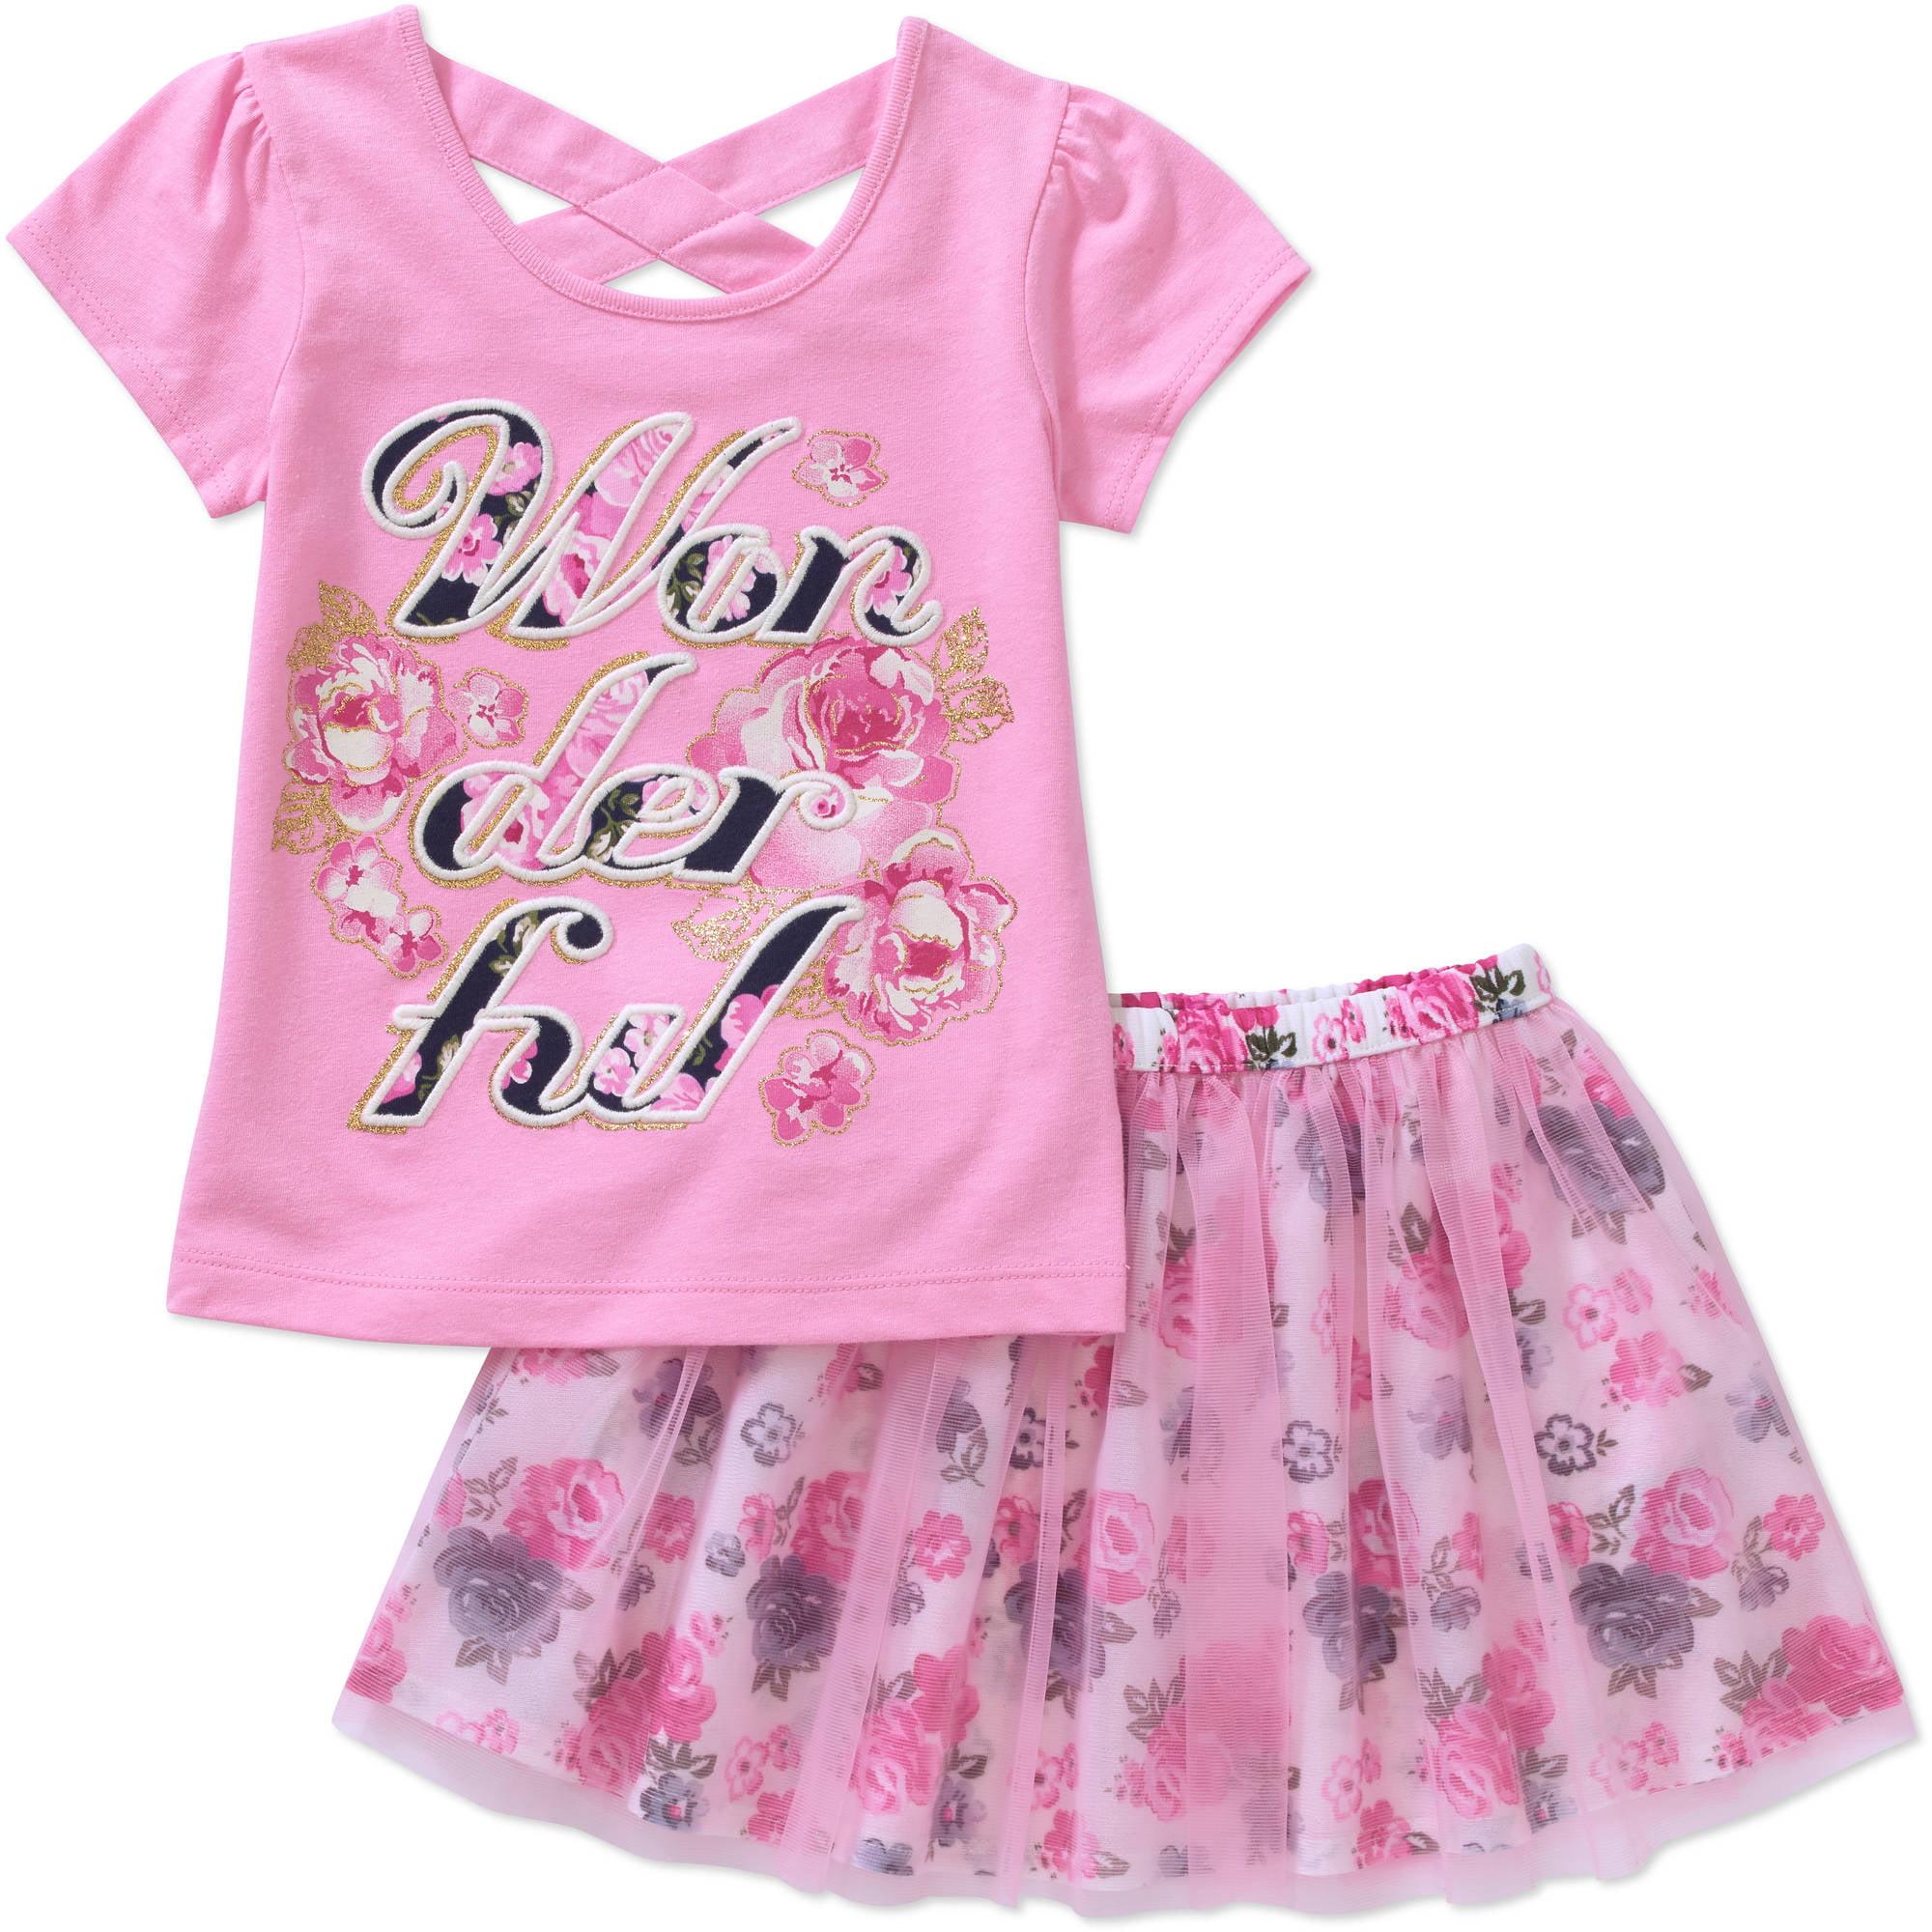 Walmart Toddler Dresses